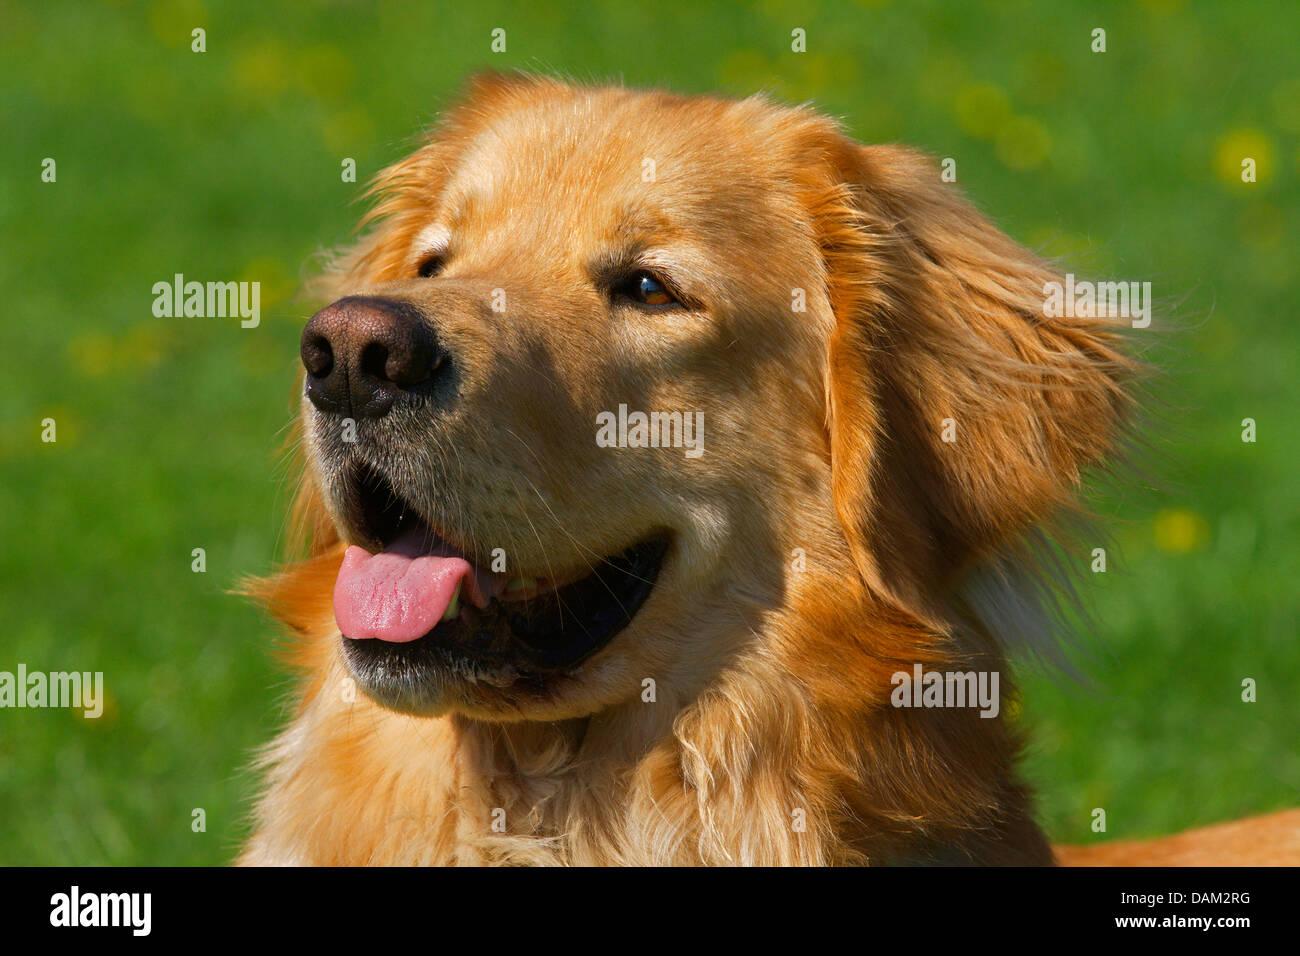 Hovawart (Canis lupus familiaris) f., retrato de una rubia perro macho, Alemania Imagen De Stock